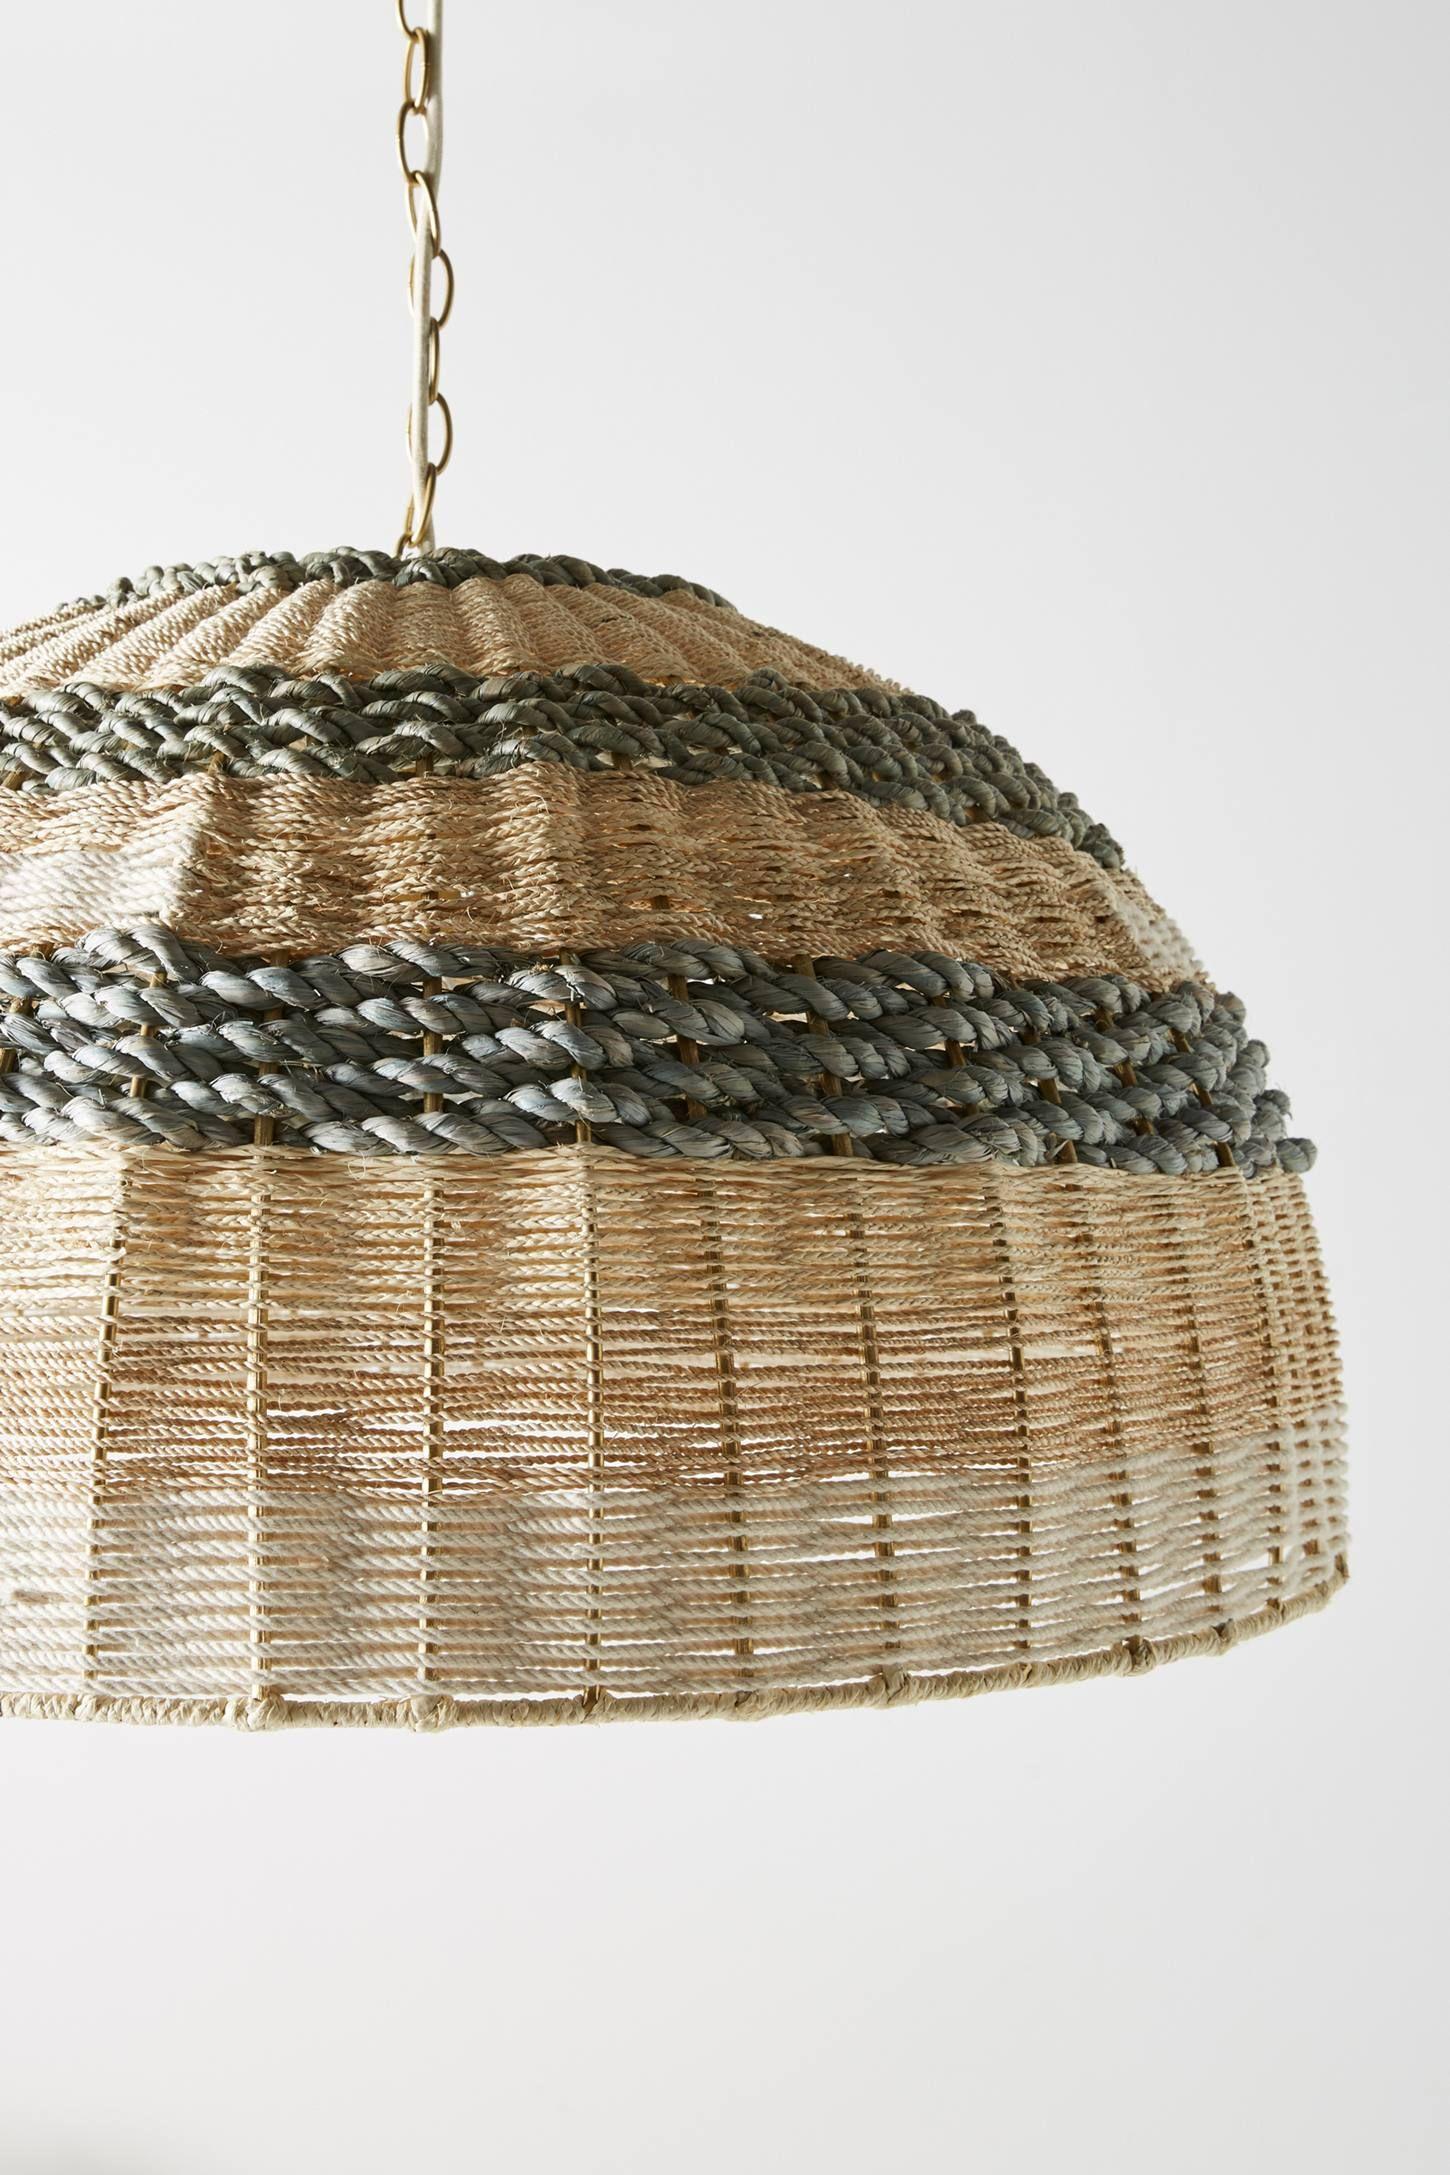 Agnes Pendant Pendants Hanging Pendants Basket Lighting